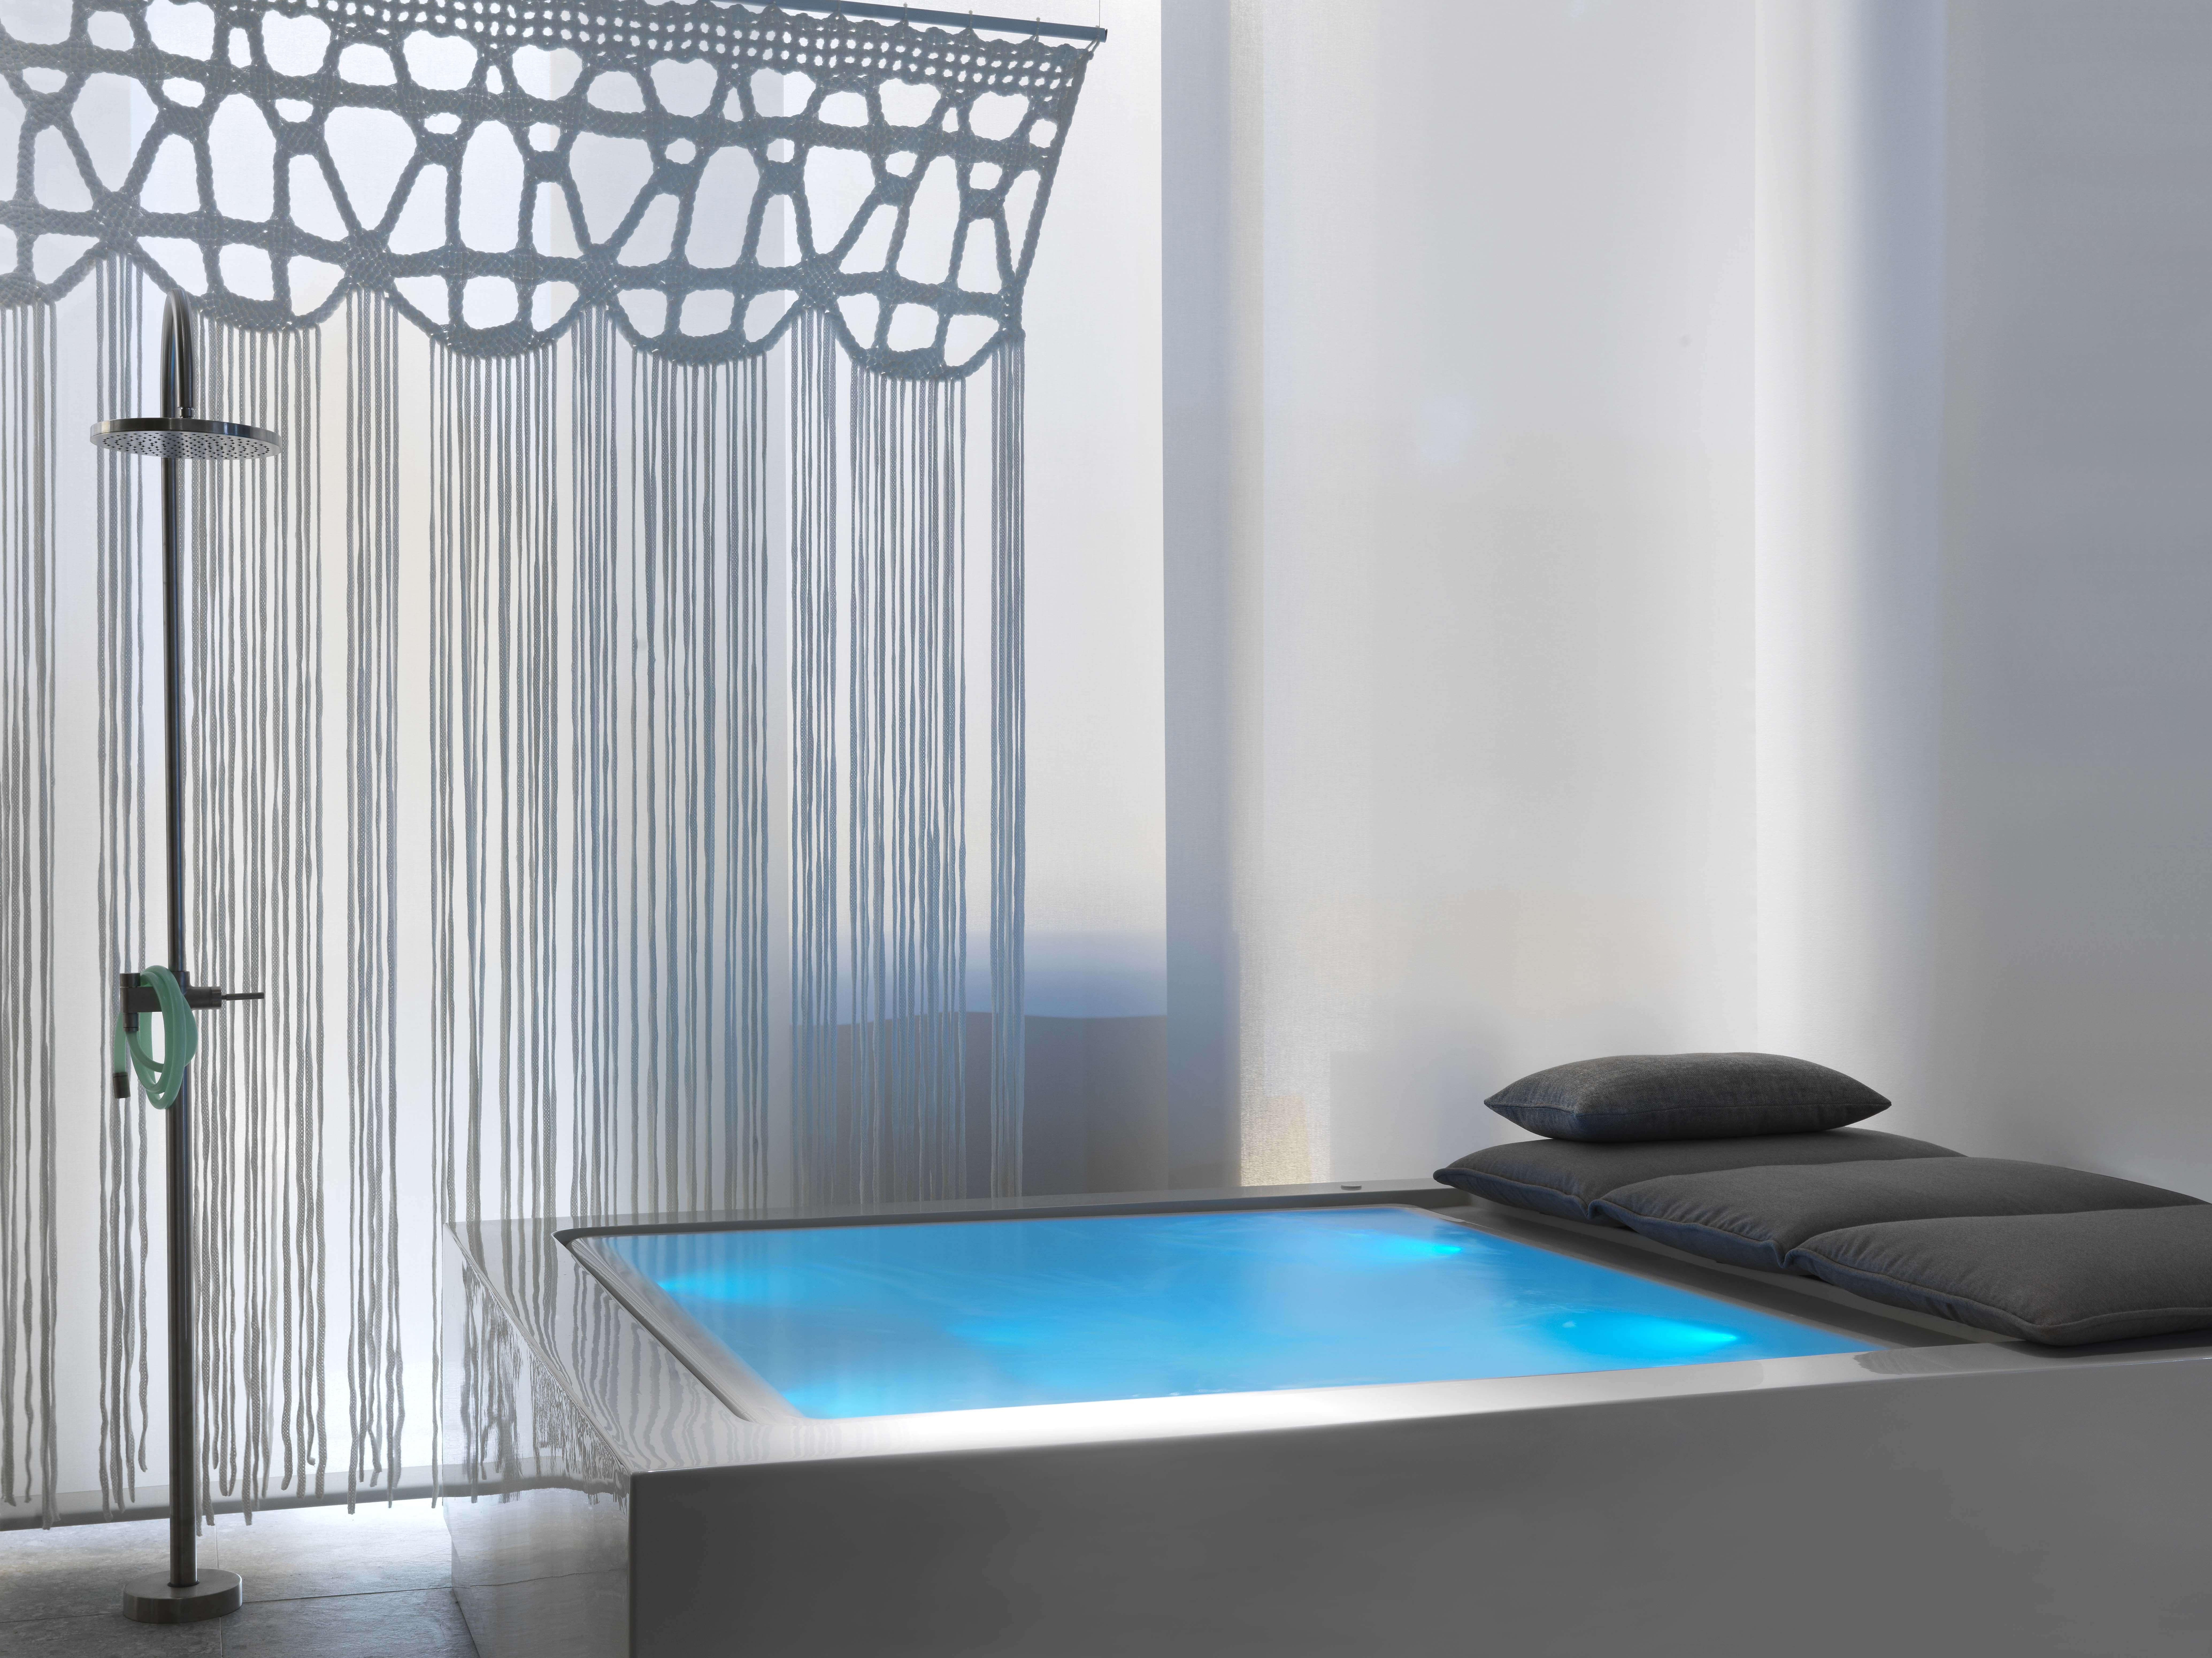 Zucchetti.Kos Pool Quadrat Relax Verkauf Beratung Spa-Designer Torsten Müller Bad Honnef nähe Köln Bonn Düsseldorf Münst